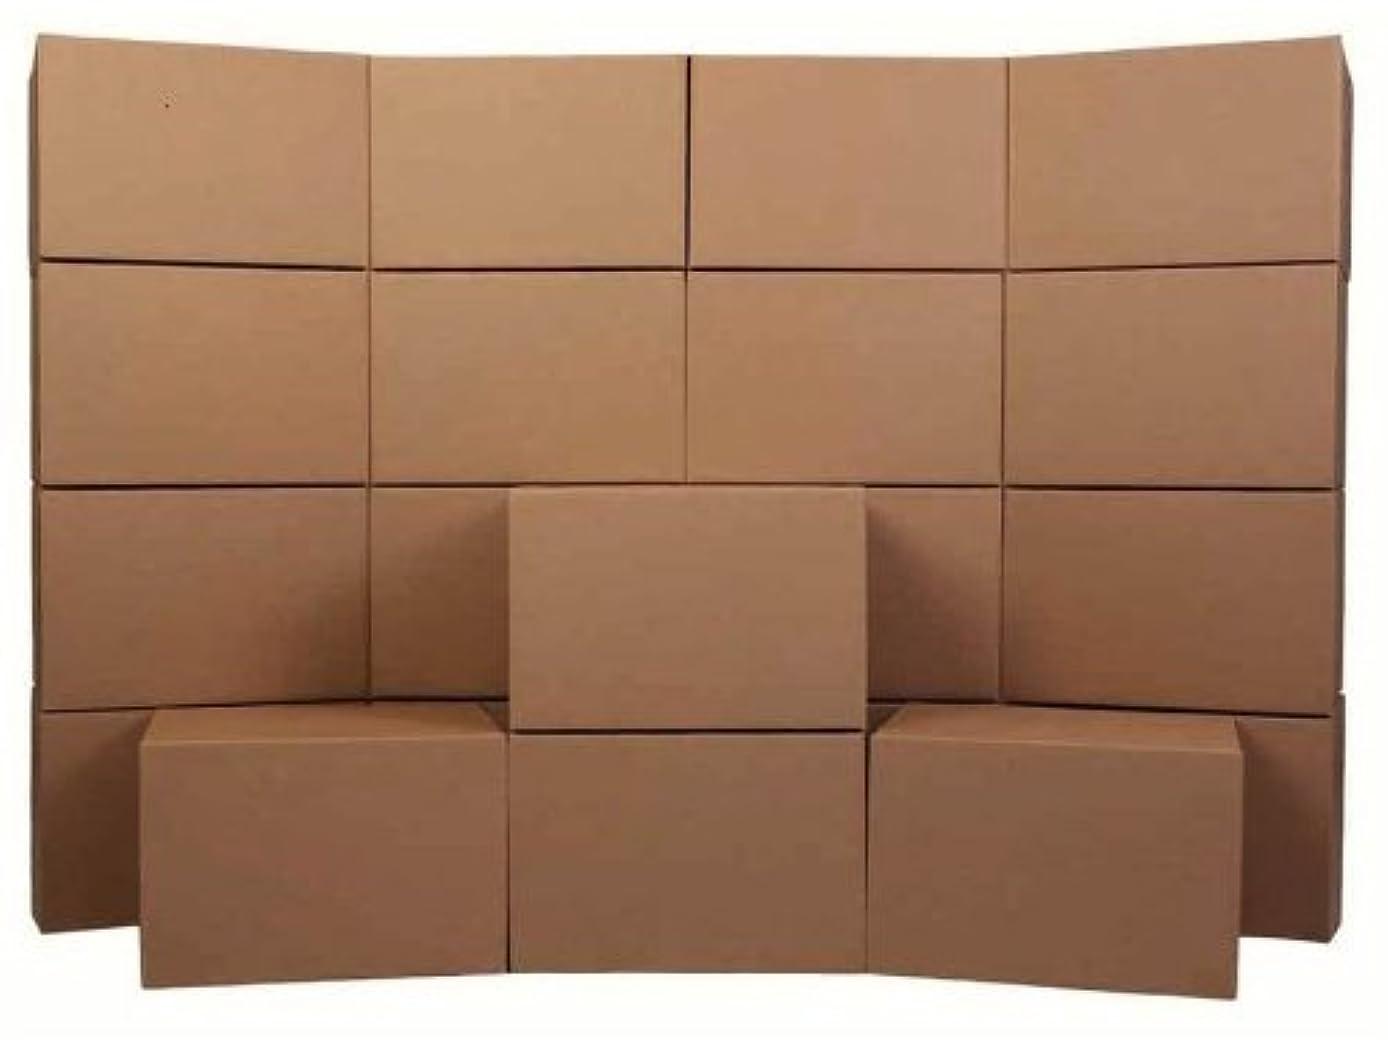 Cheap Cheap Moving Boxes LLC 20-Pack Medium Carton Boxes (Moving Boxes)